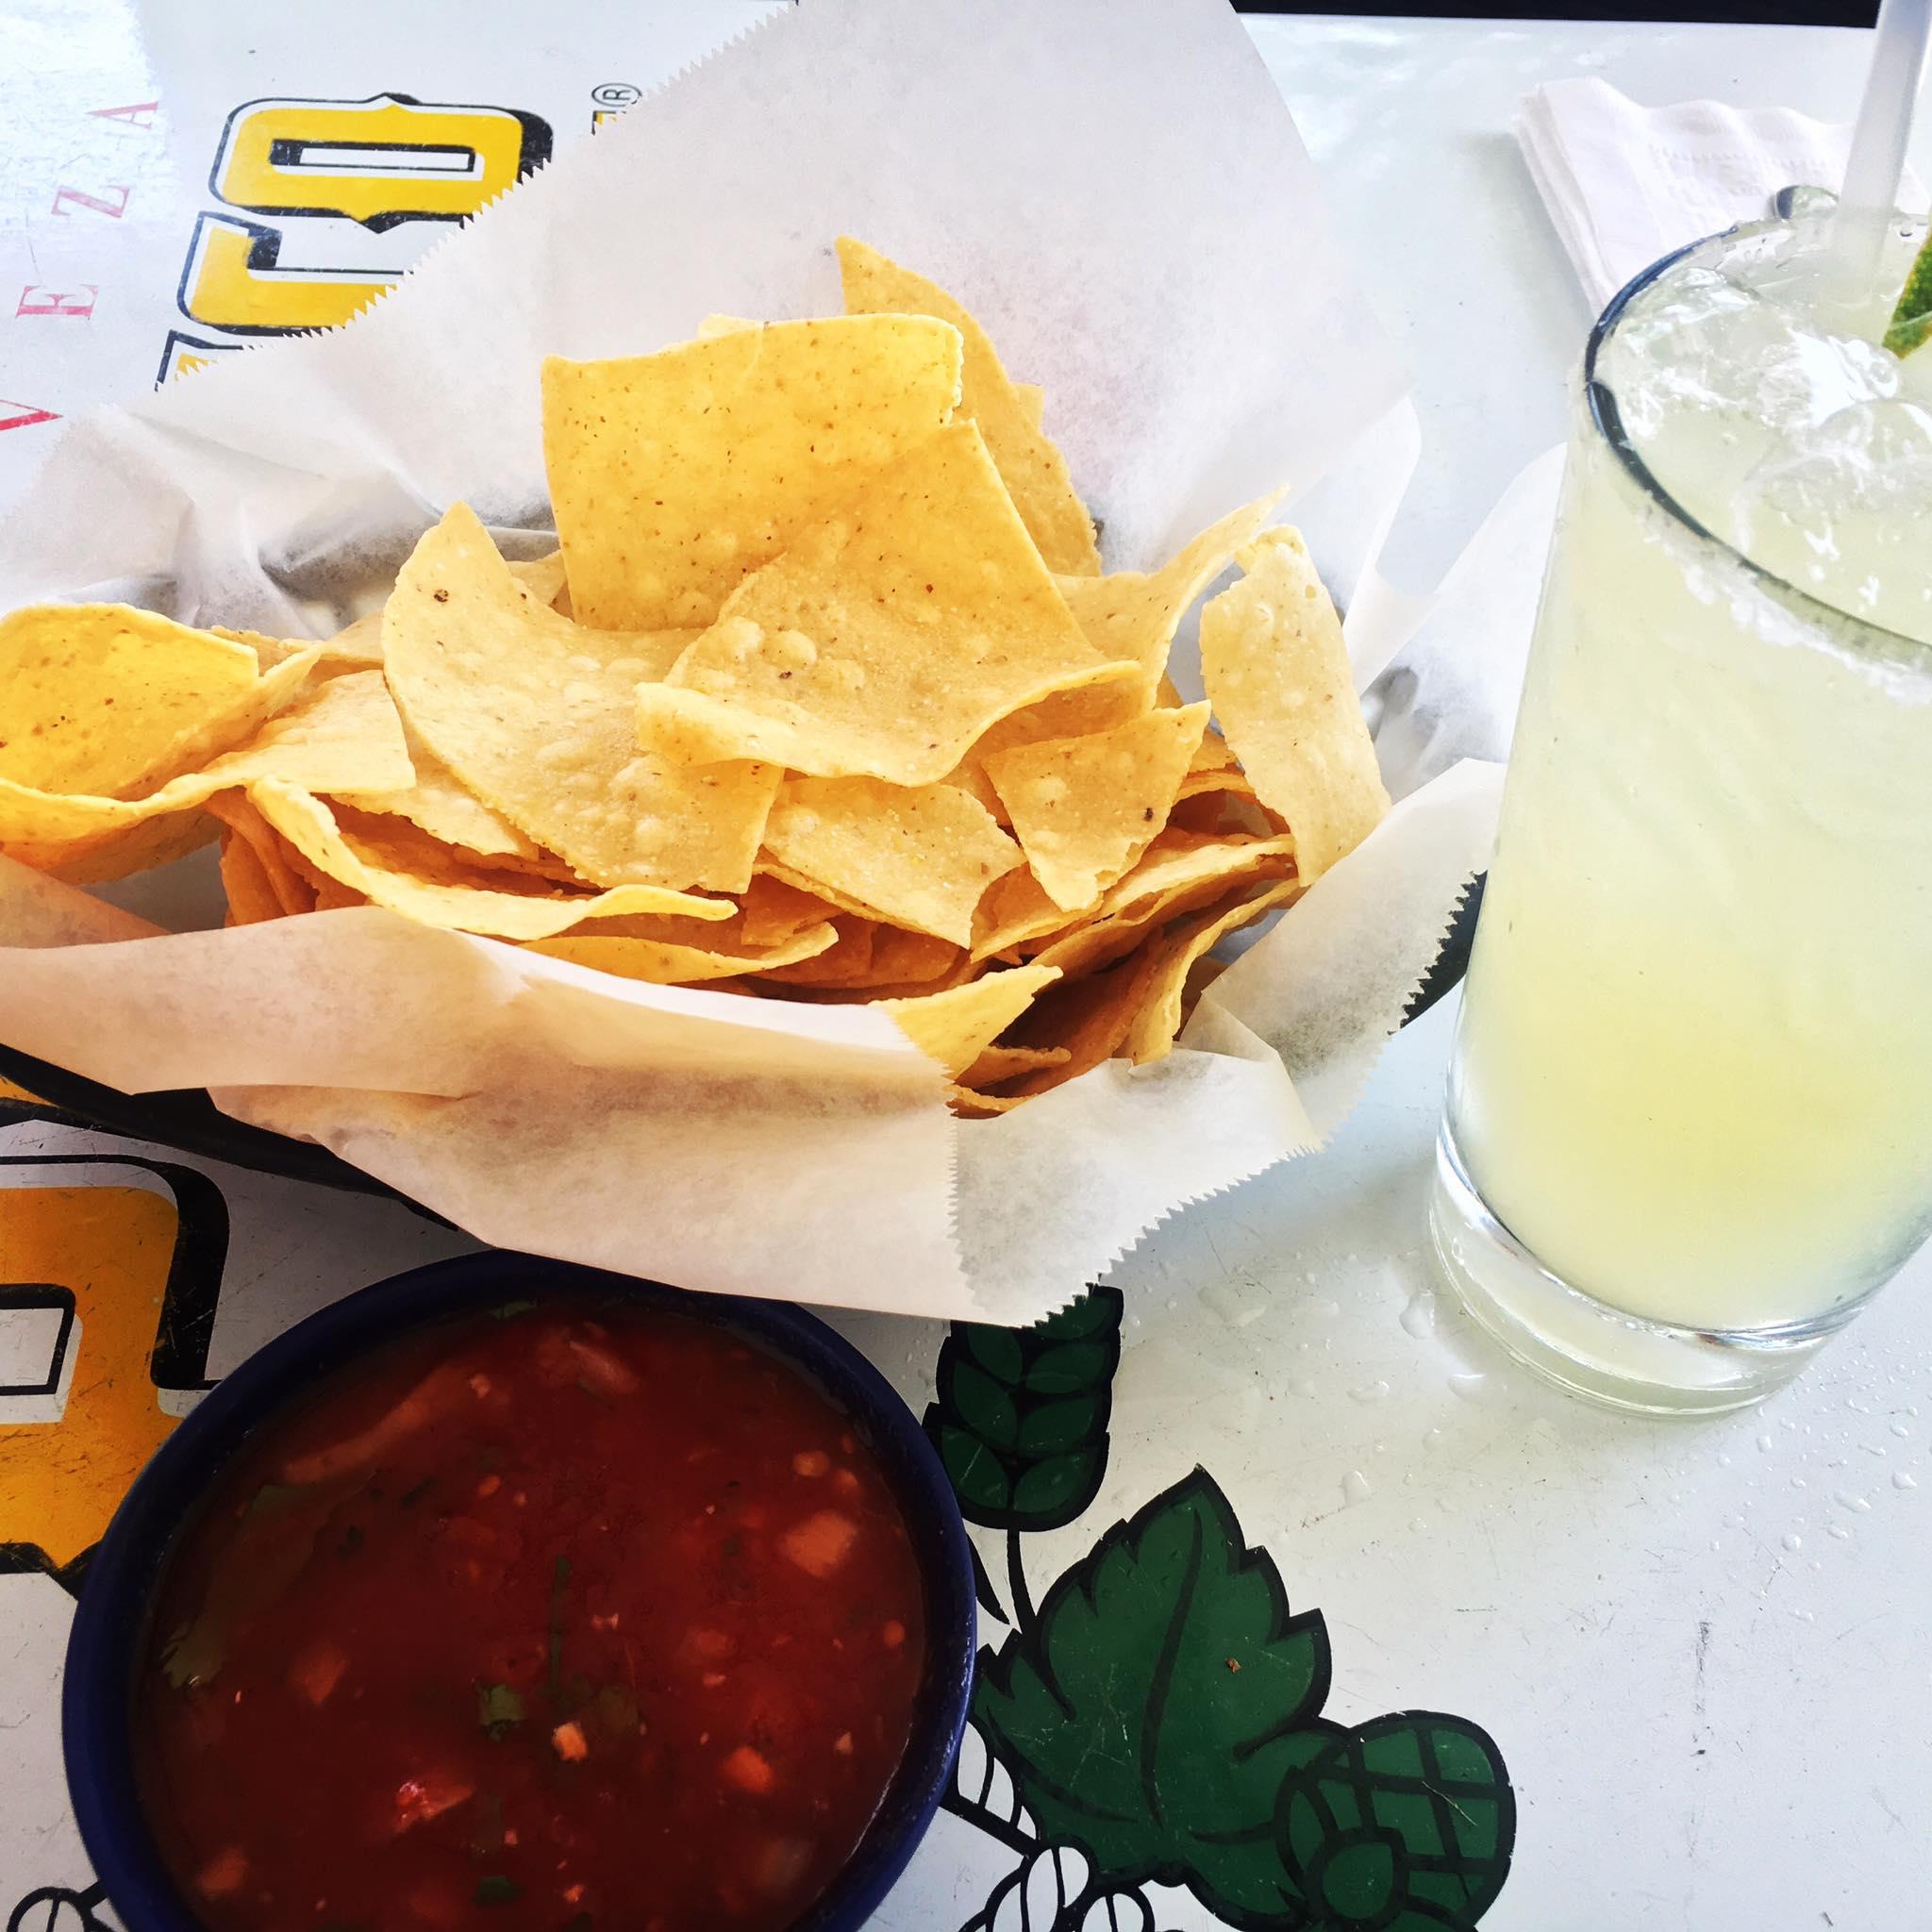 Rita, Chips and Salsa